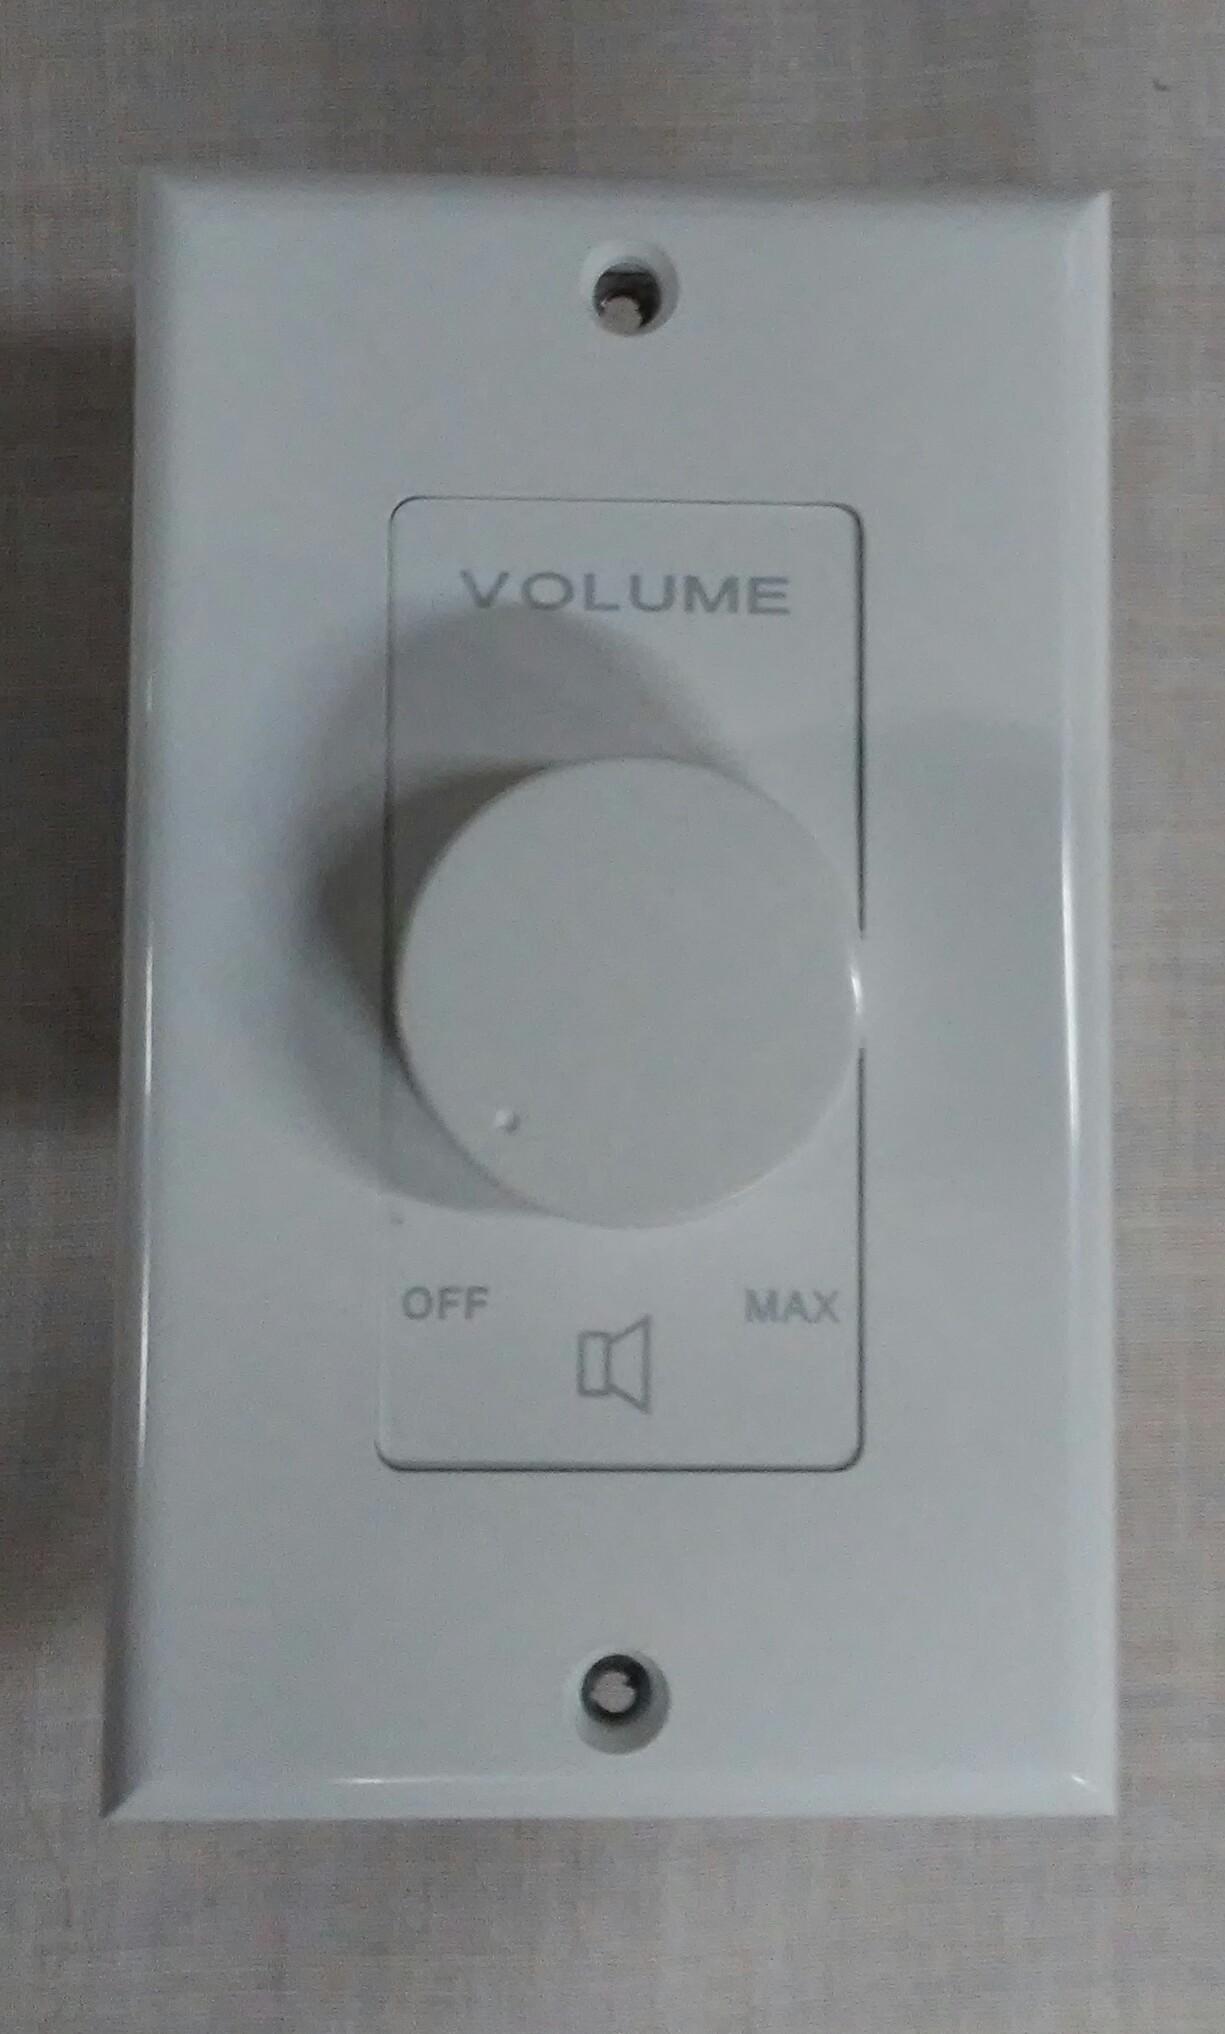 VC1070TD   10 Watt / 70 Volt Volume Control